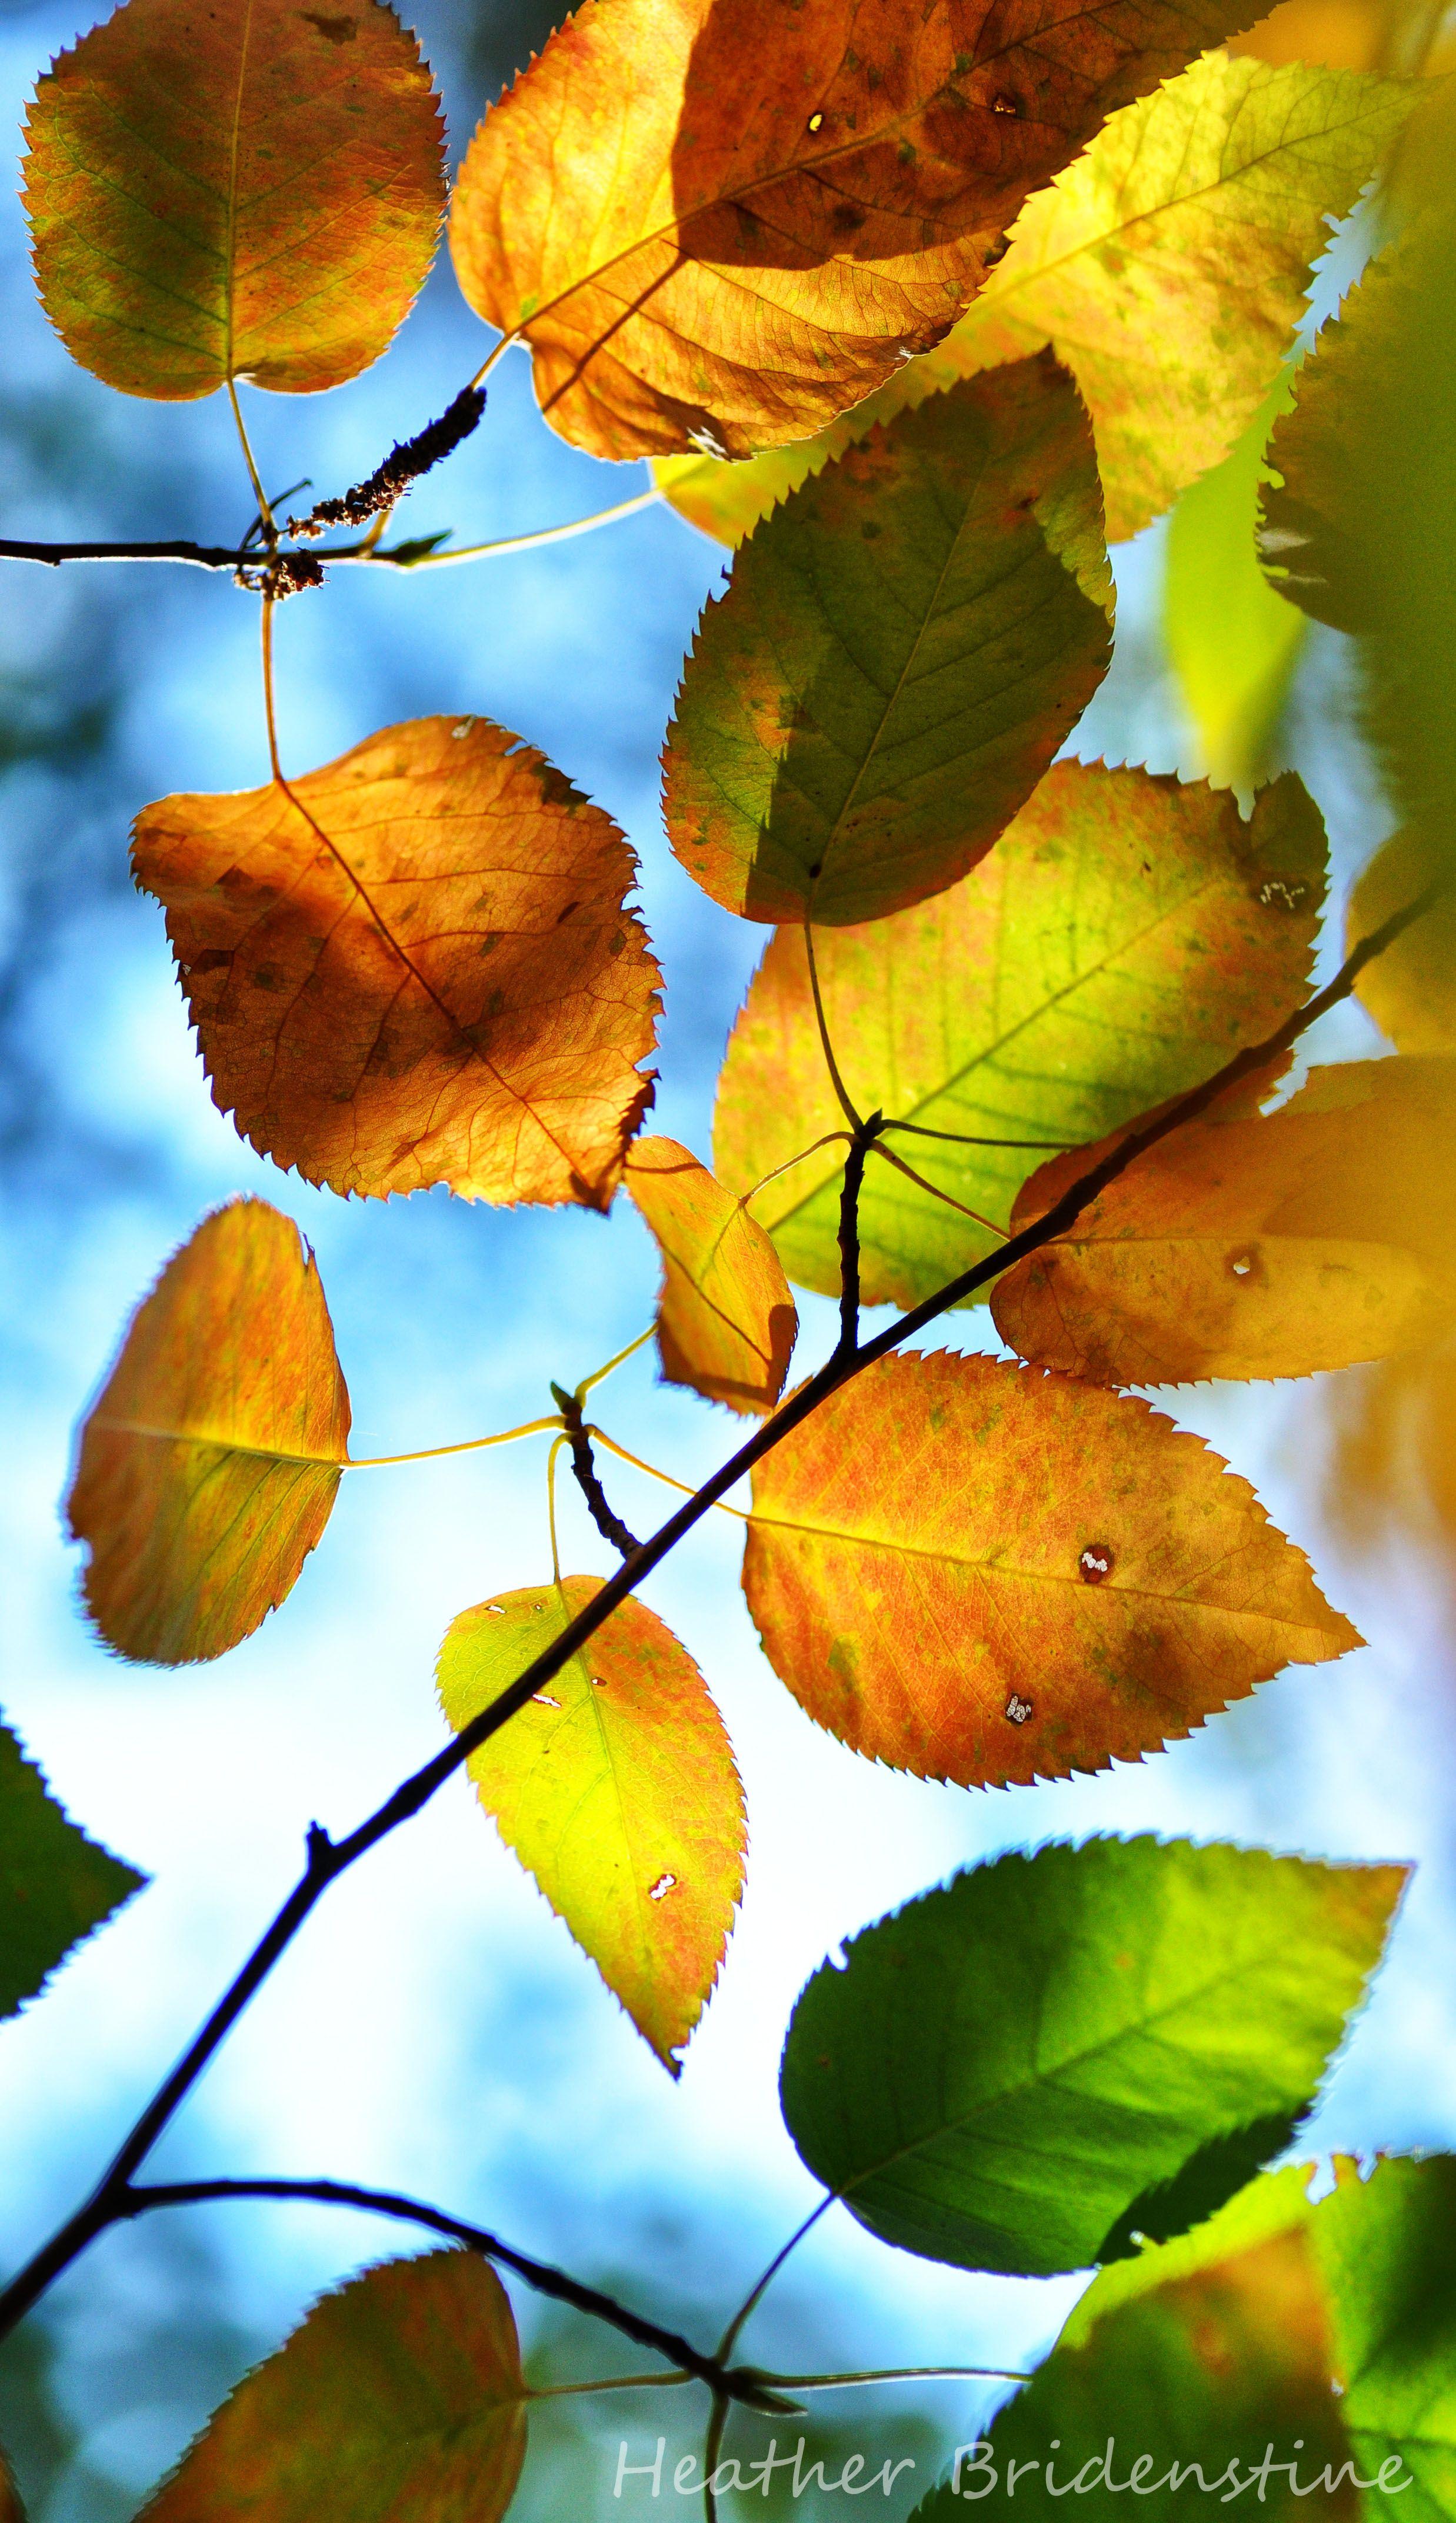 Changing color | FLORES E NATUREZA | Pinterest | Hoja, Otoño y ...